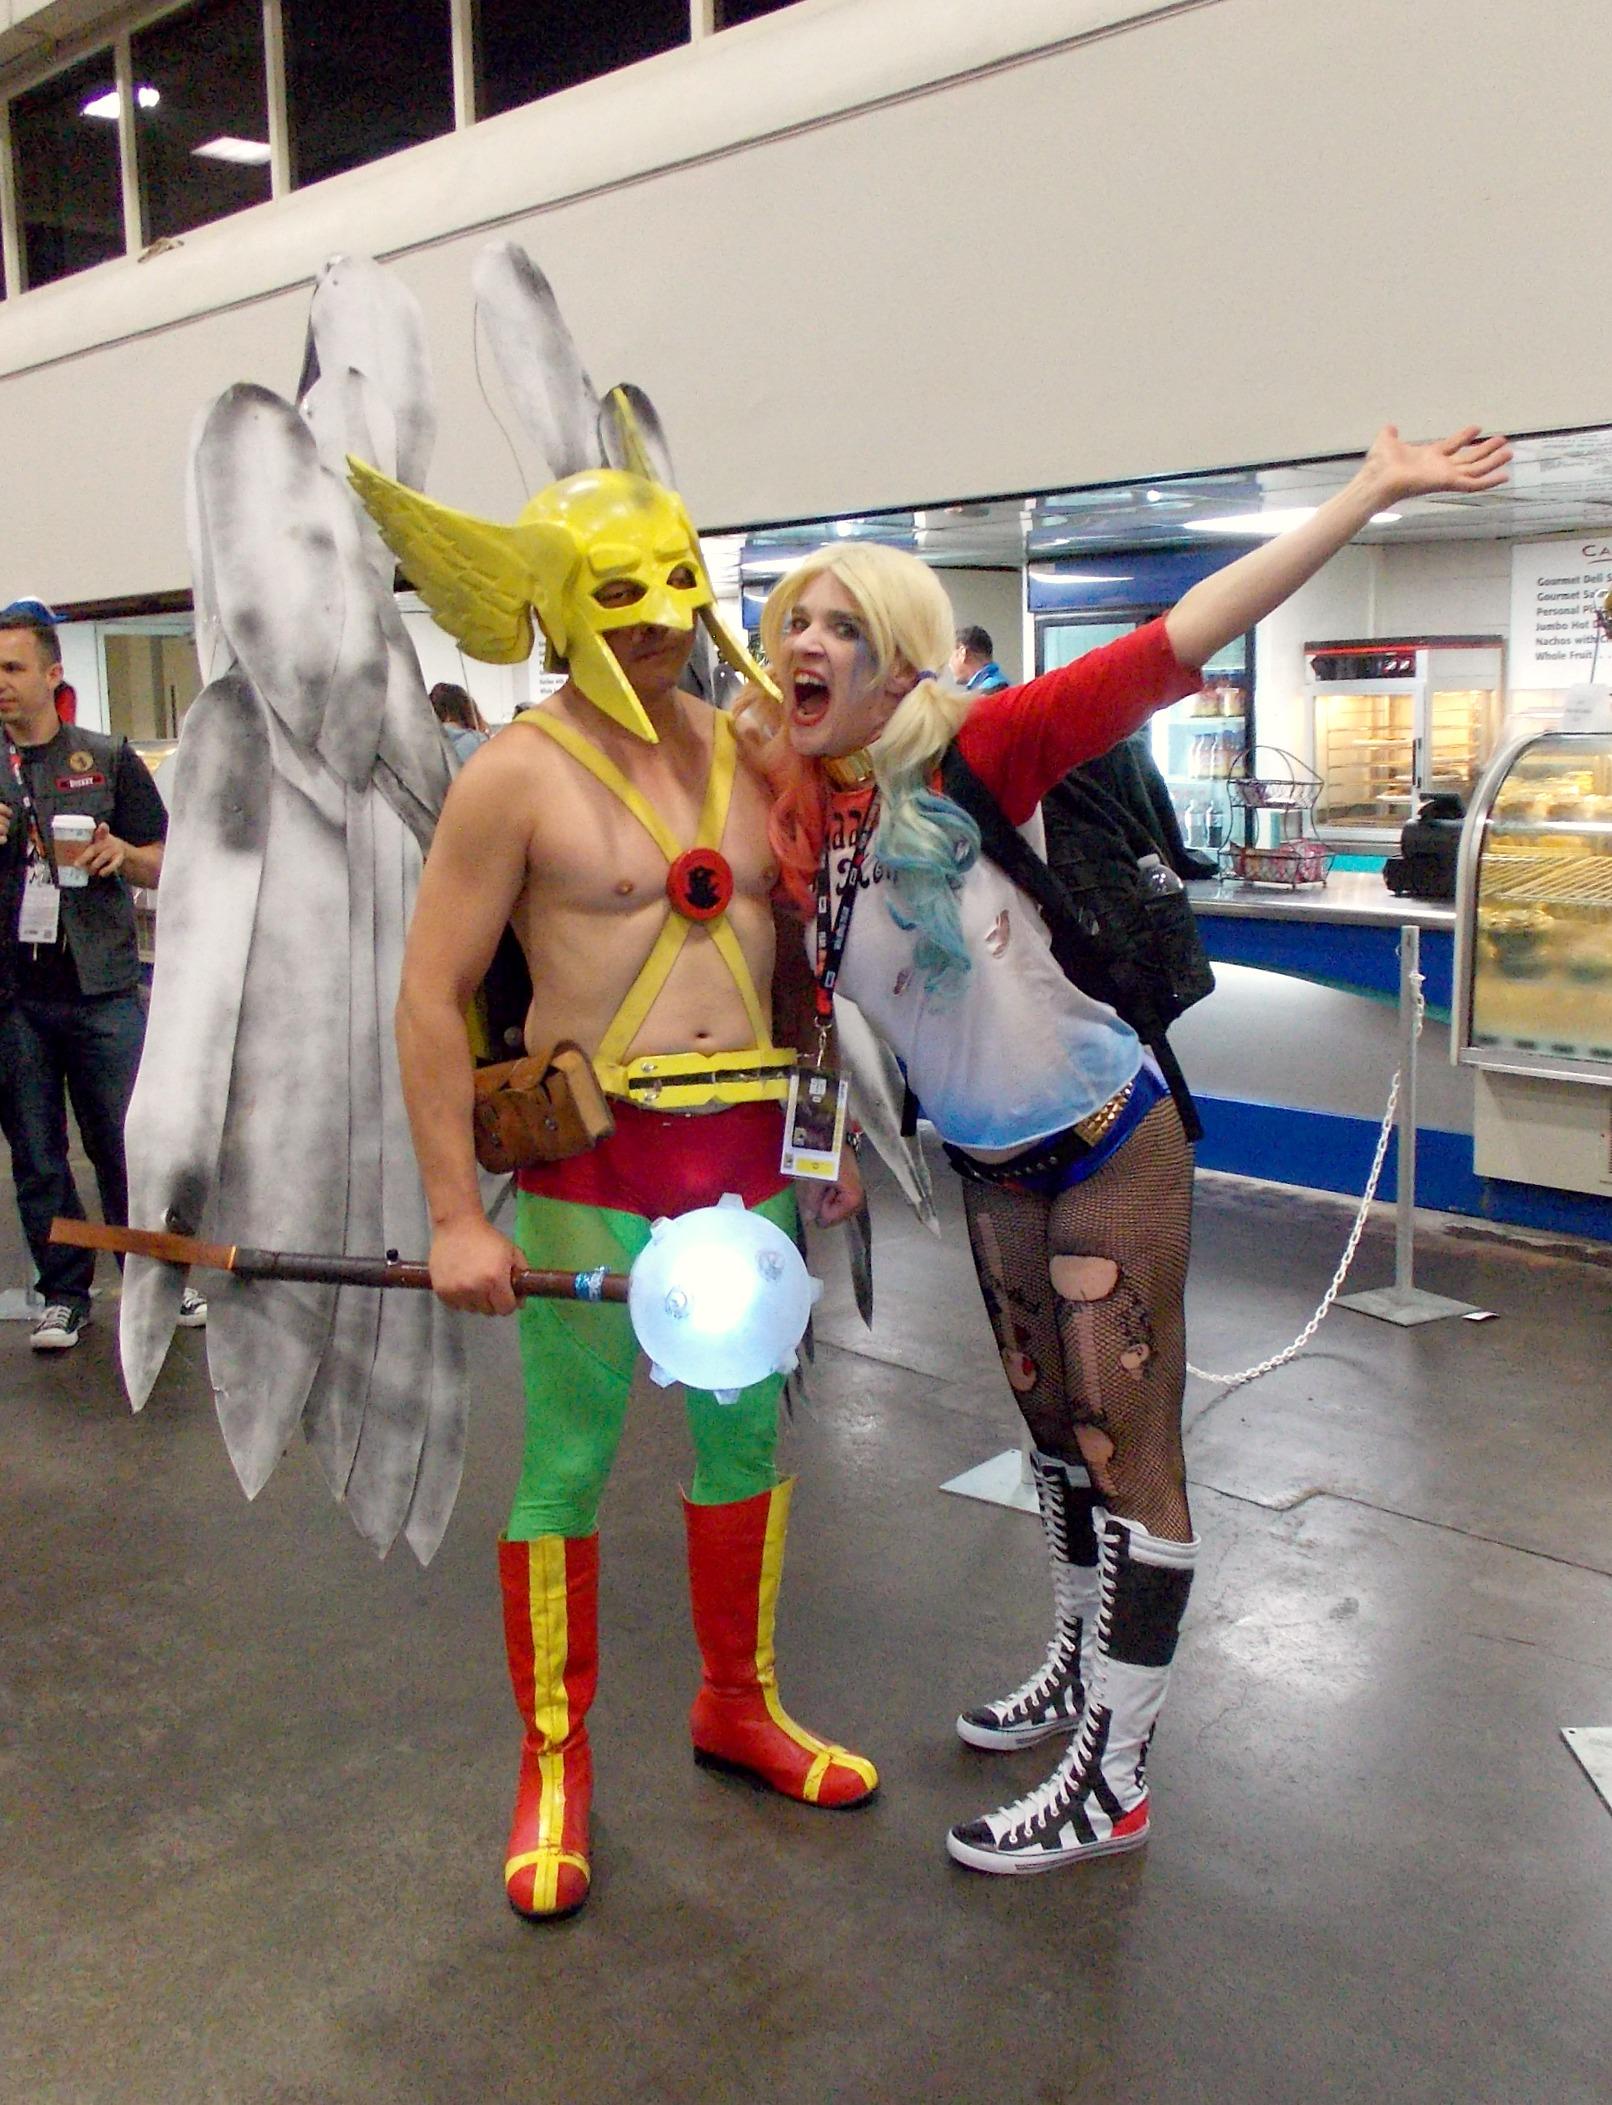 Hawkman and Harley